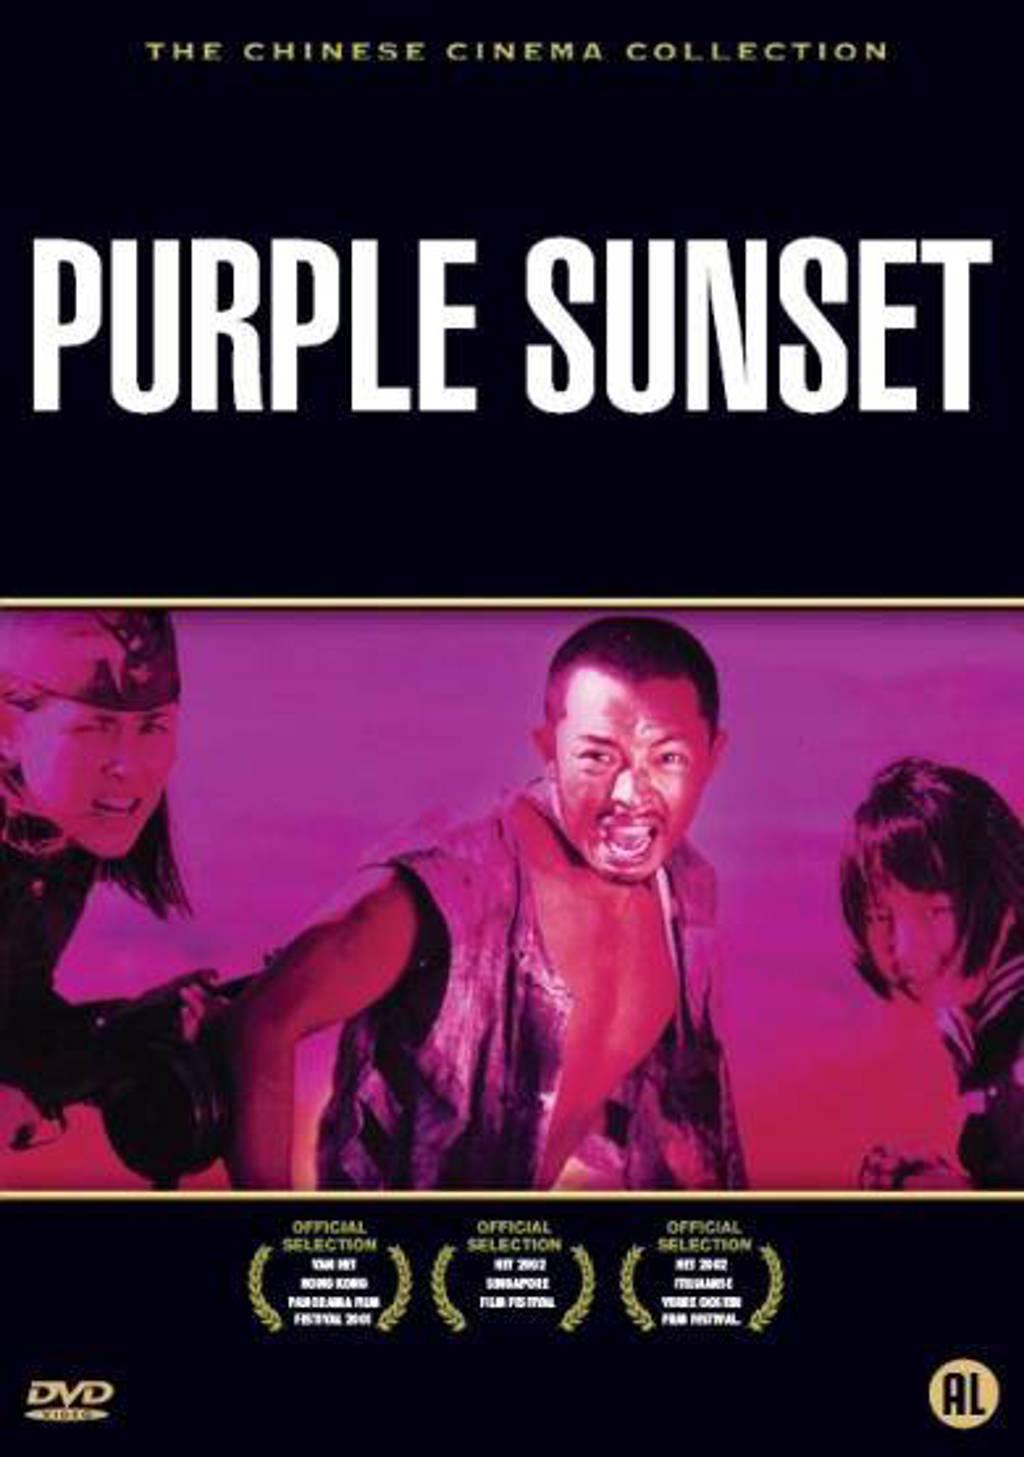 Purple sunset (DVD)